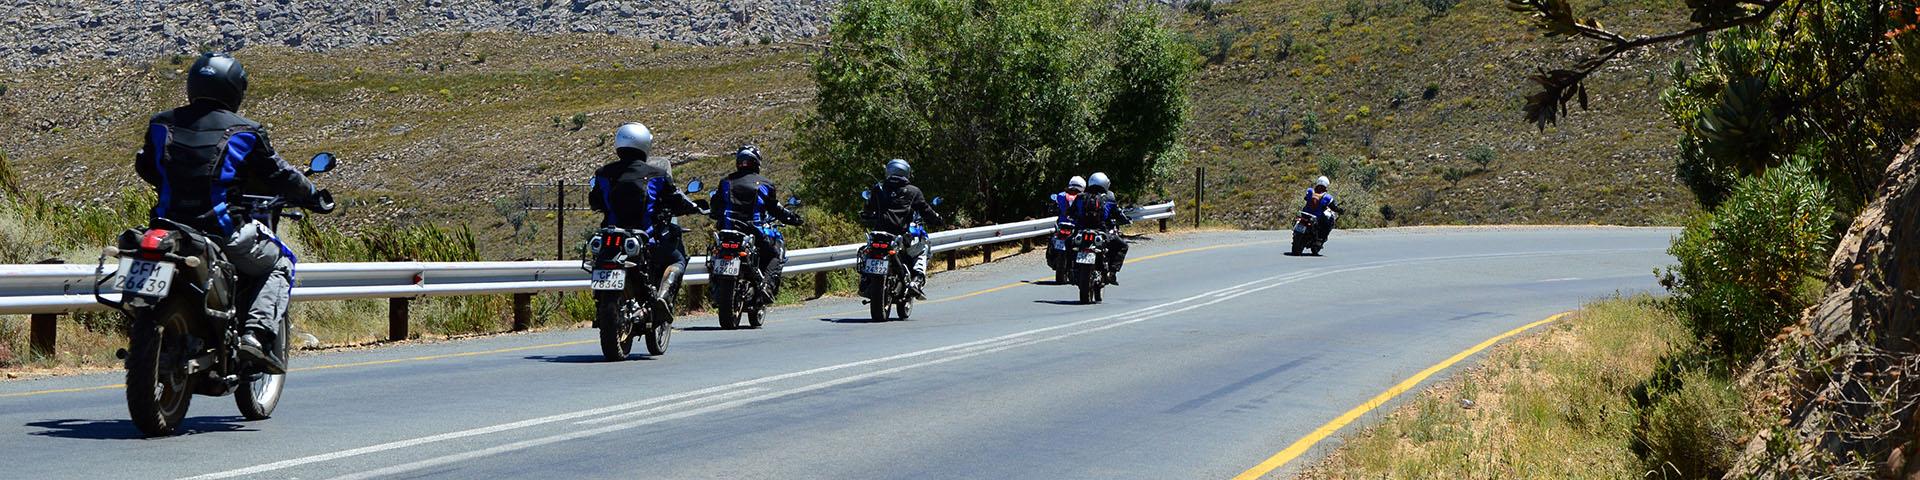 Ride The Western Cape